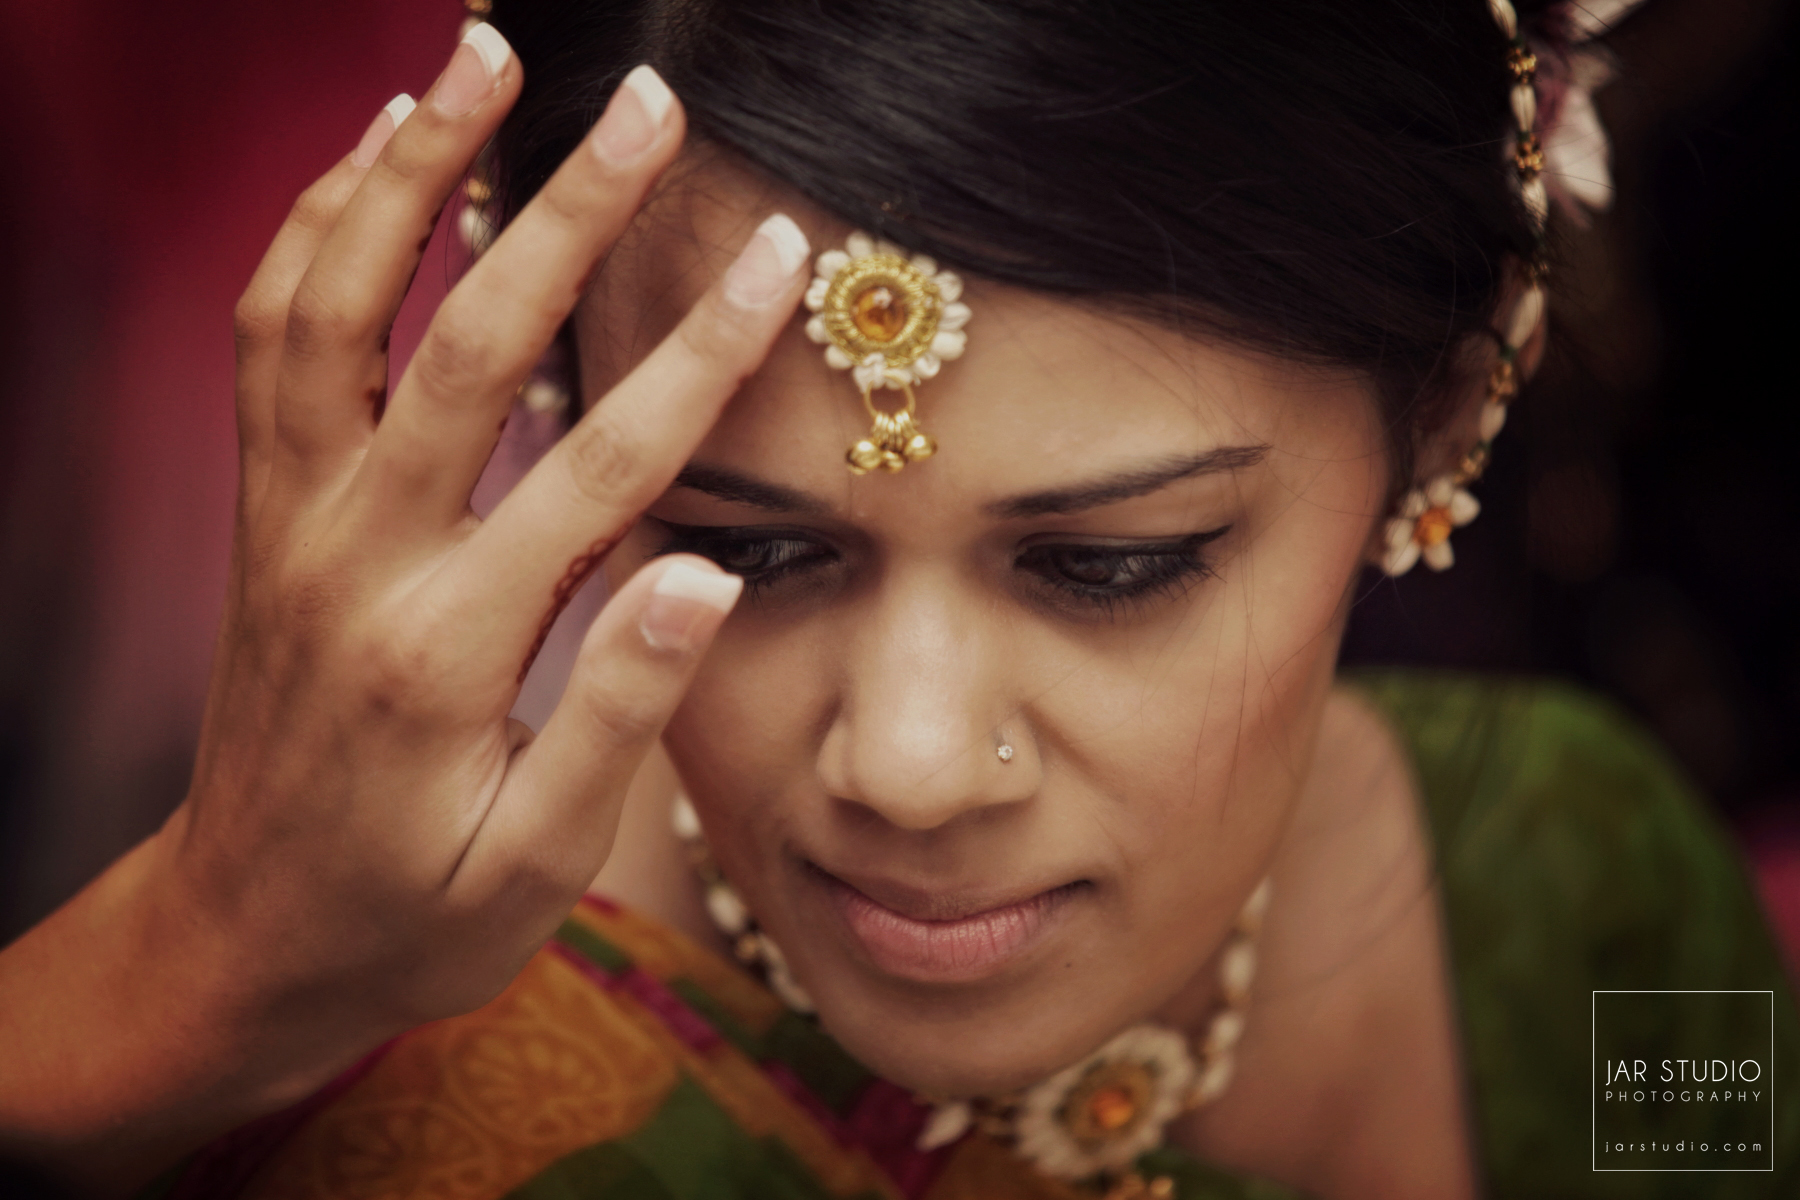 01-bride-mehndi-jarstudio-photography.JPG